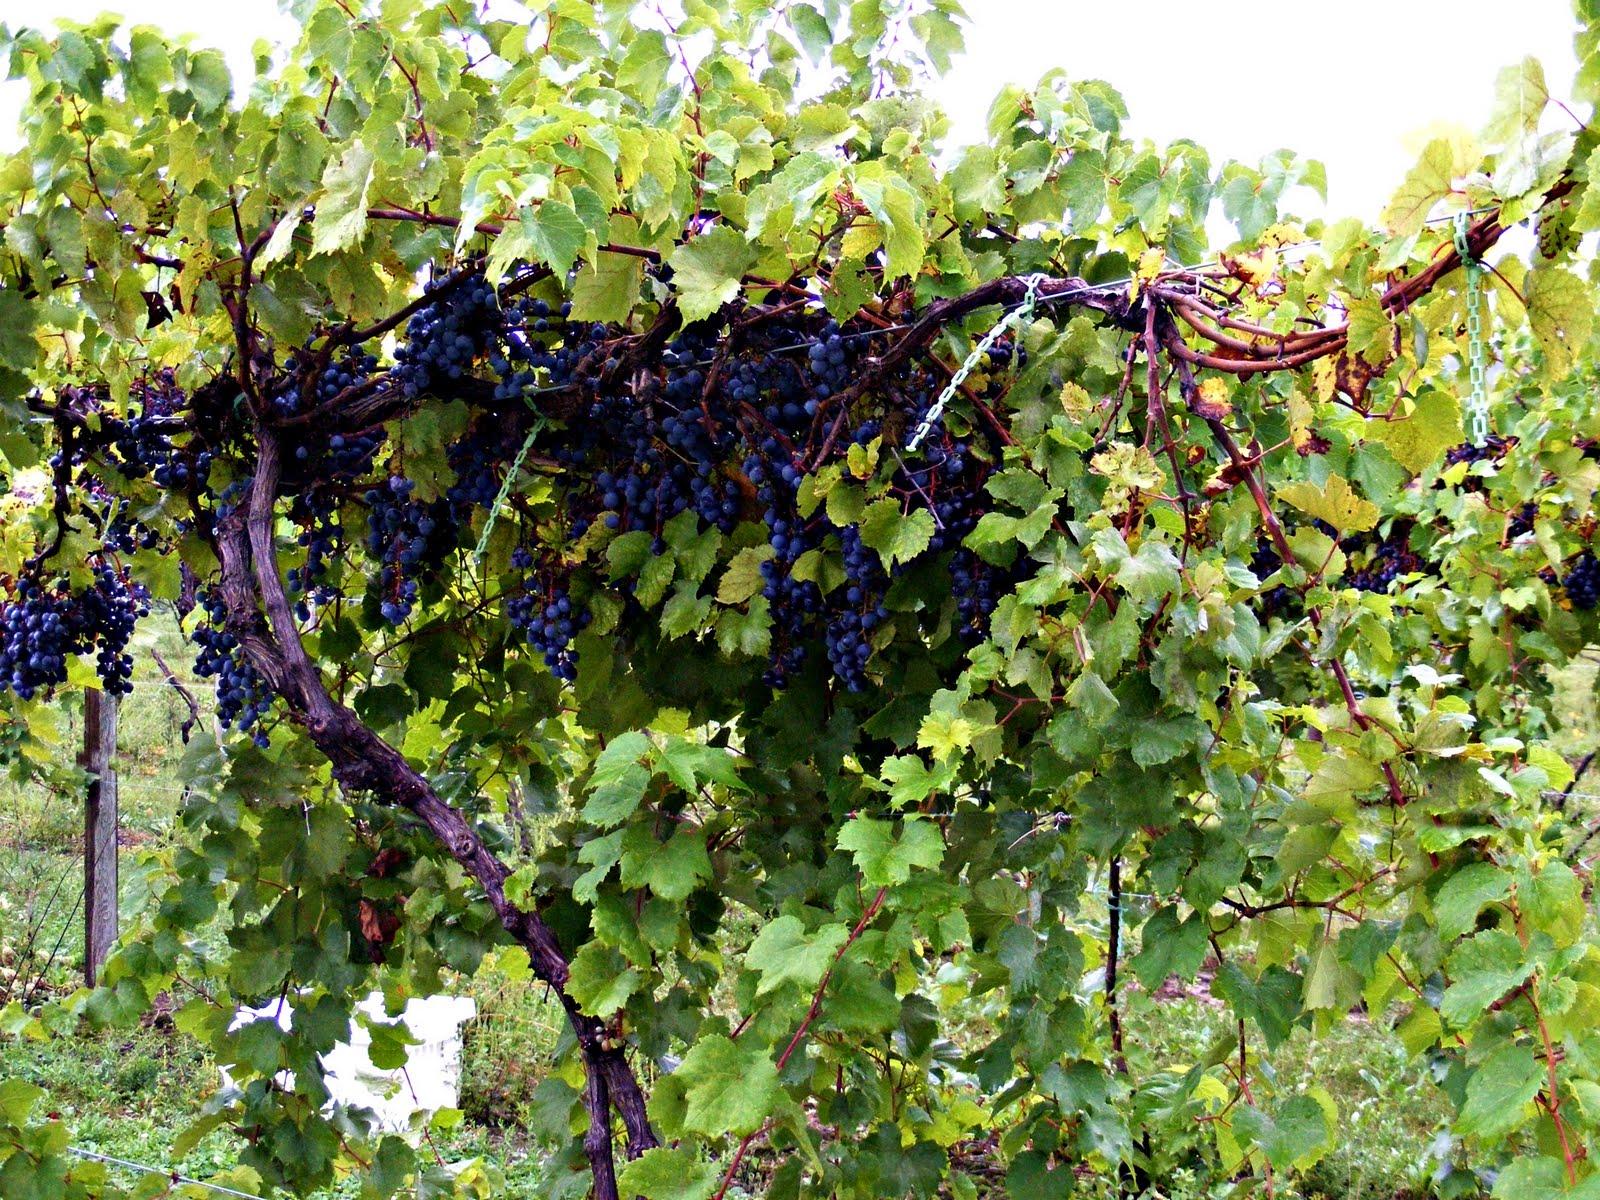 images of grape vines - photo #22